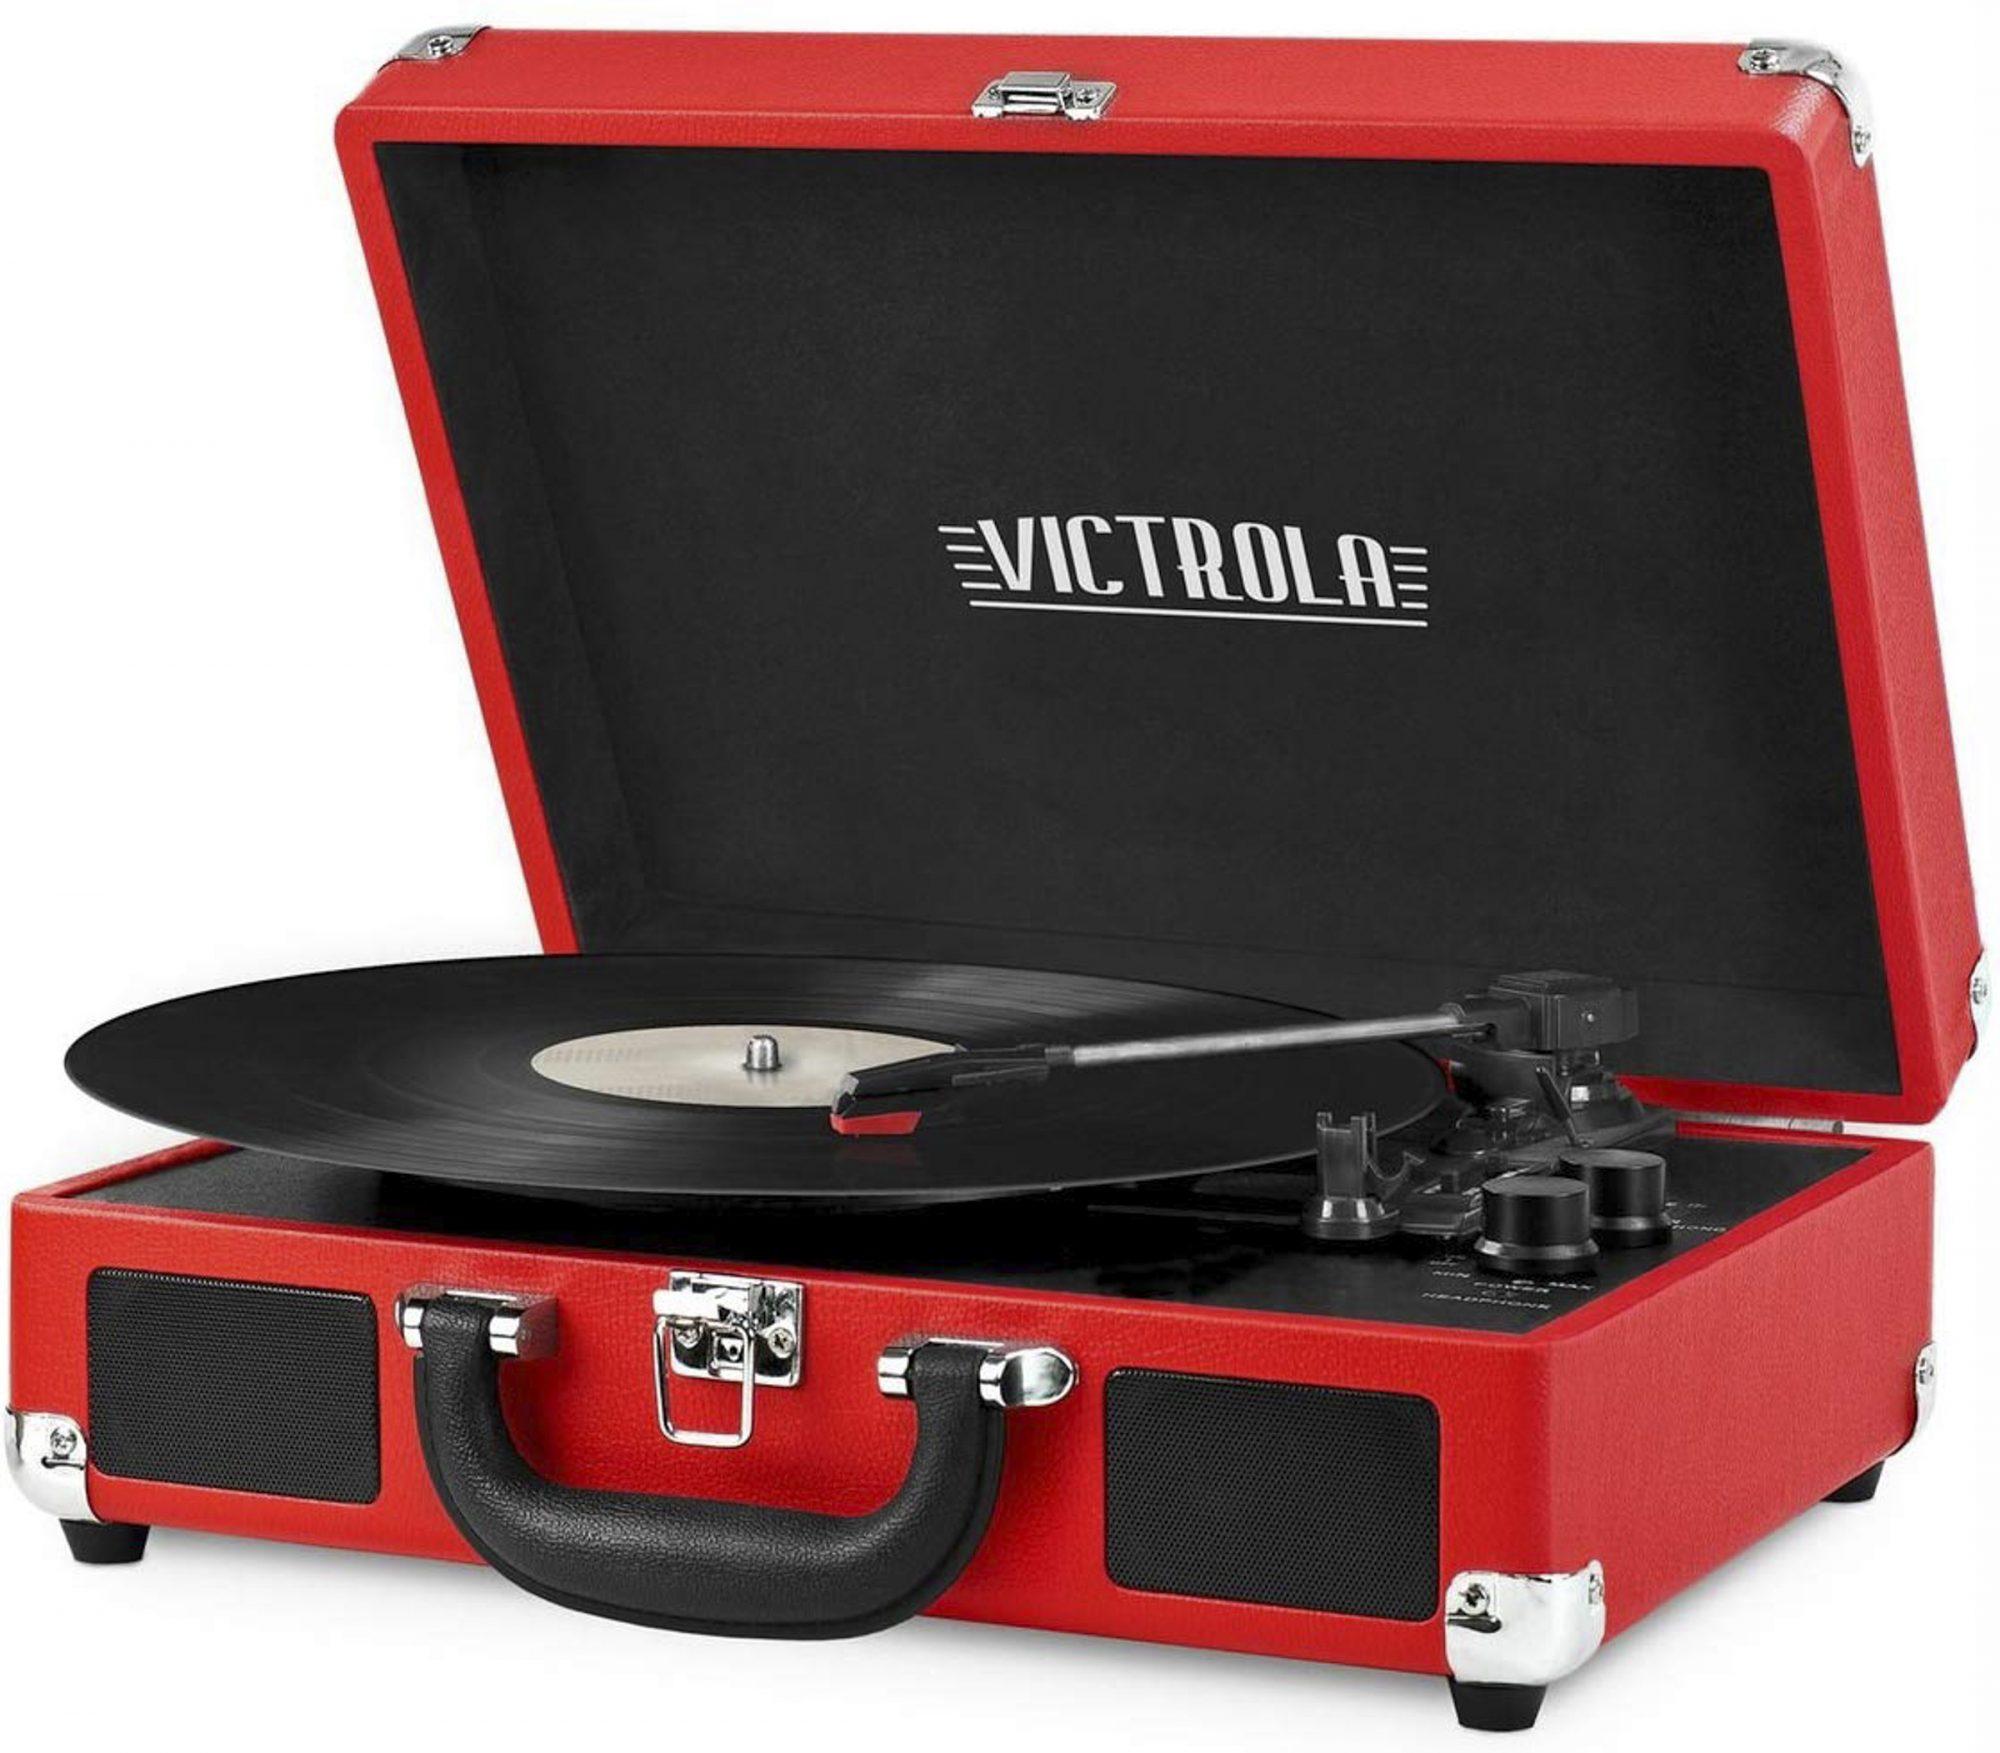 Victrola Vintage 3-Speed Bluetooth Suitcase Turntable with Speakers, Red